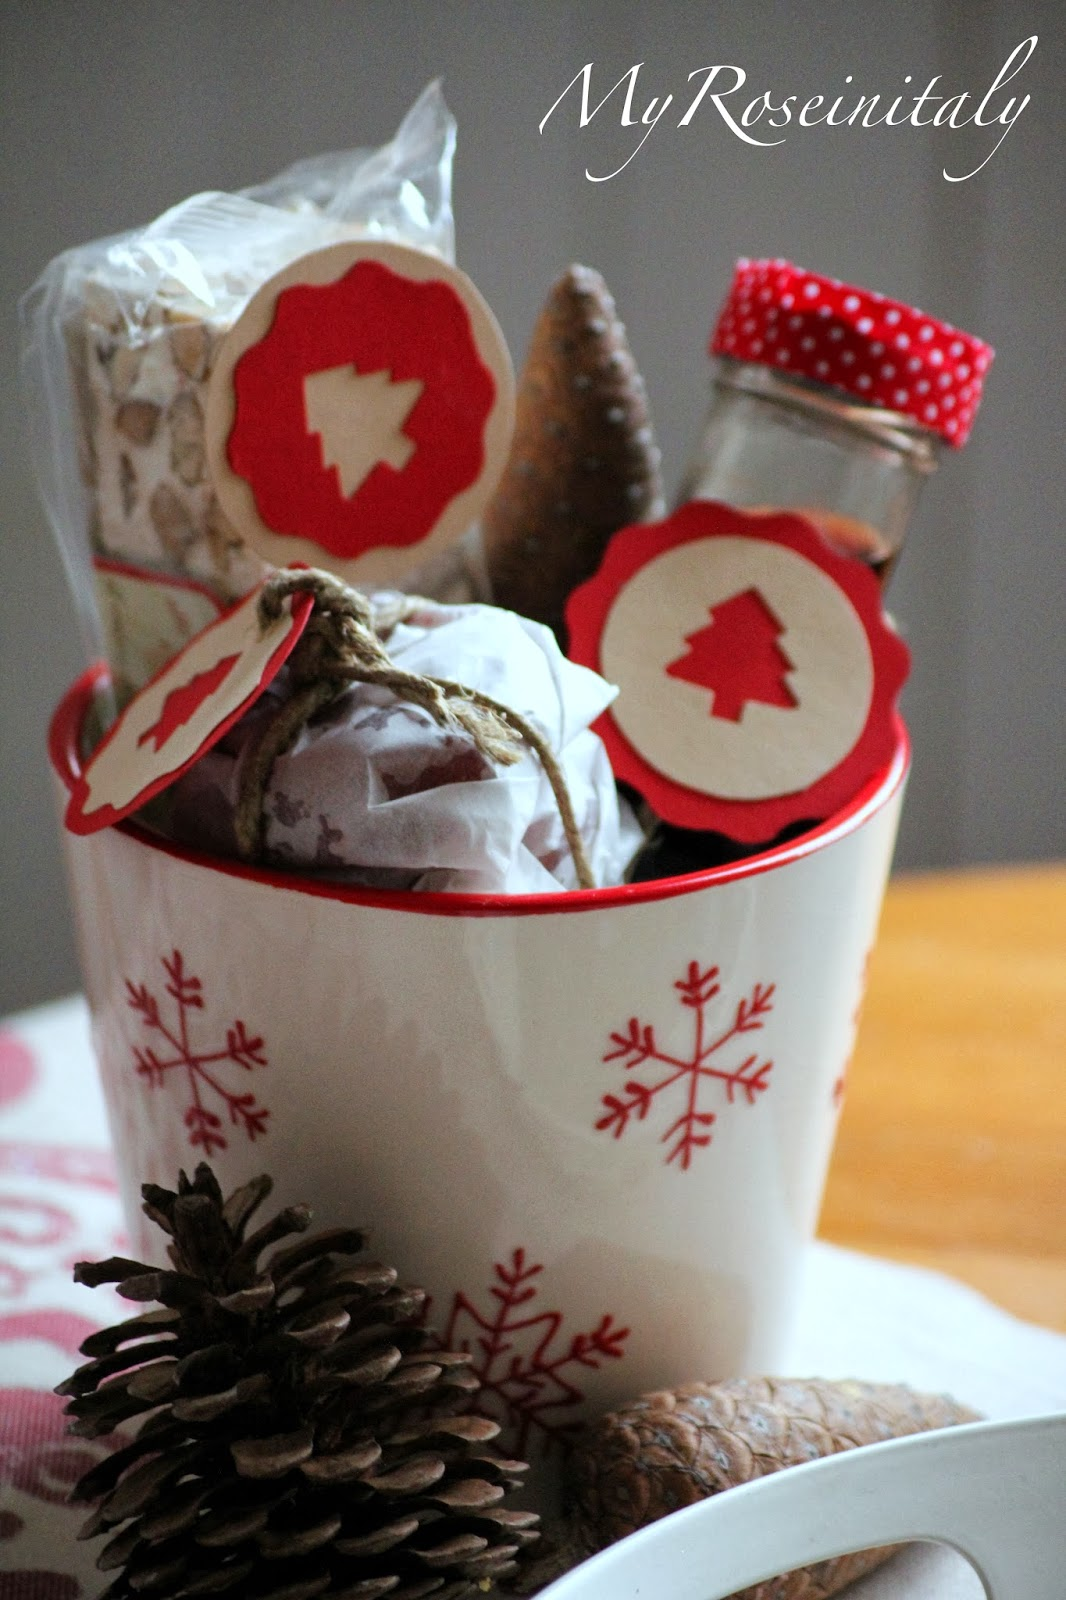 My roseinitaly regali handmade cache pot natalizio for Casa e regali